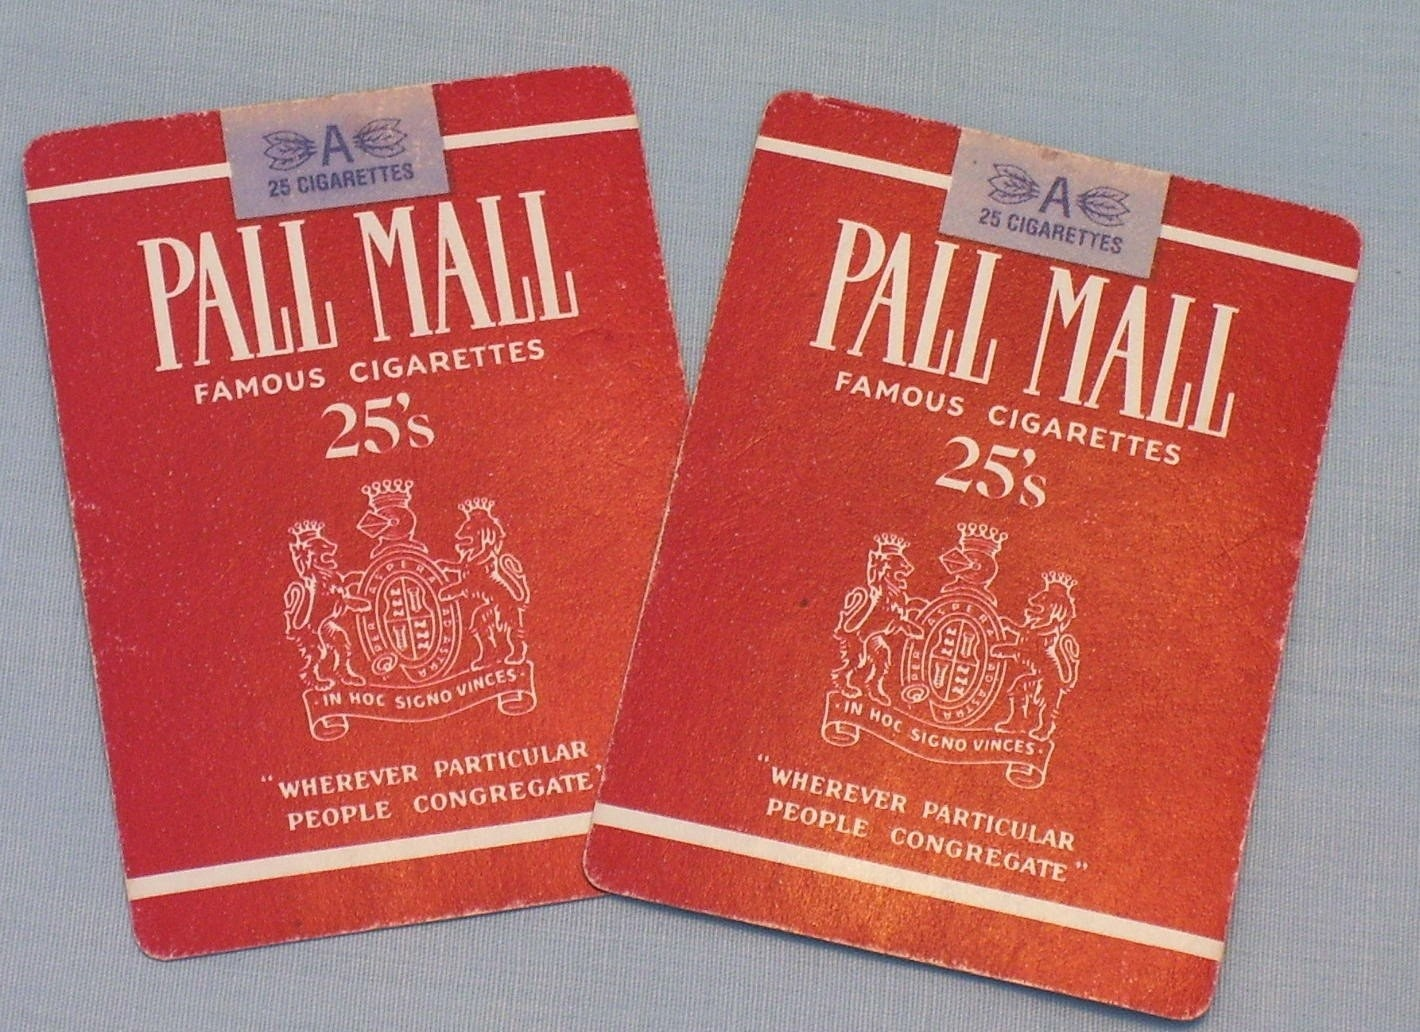 Printable Cigarette Coupons 2019: Free Pall Mall Cigarette Coupons - Free Pack Of Cigarettes Printable Coupon